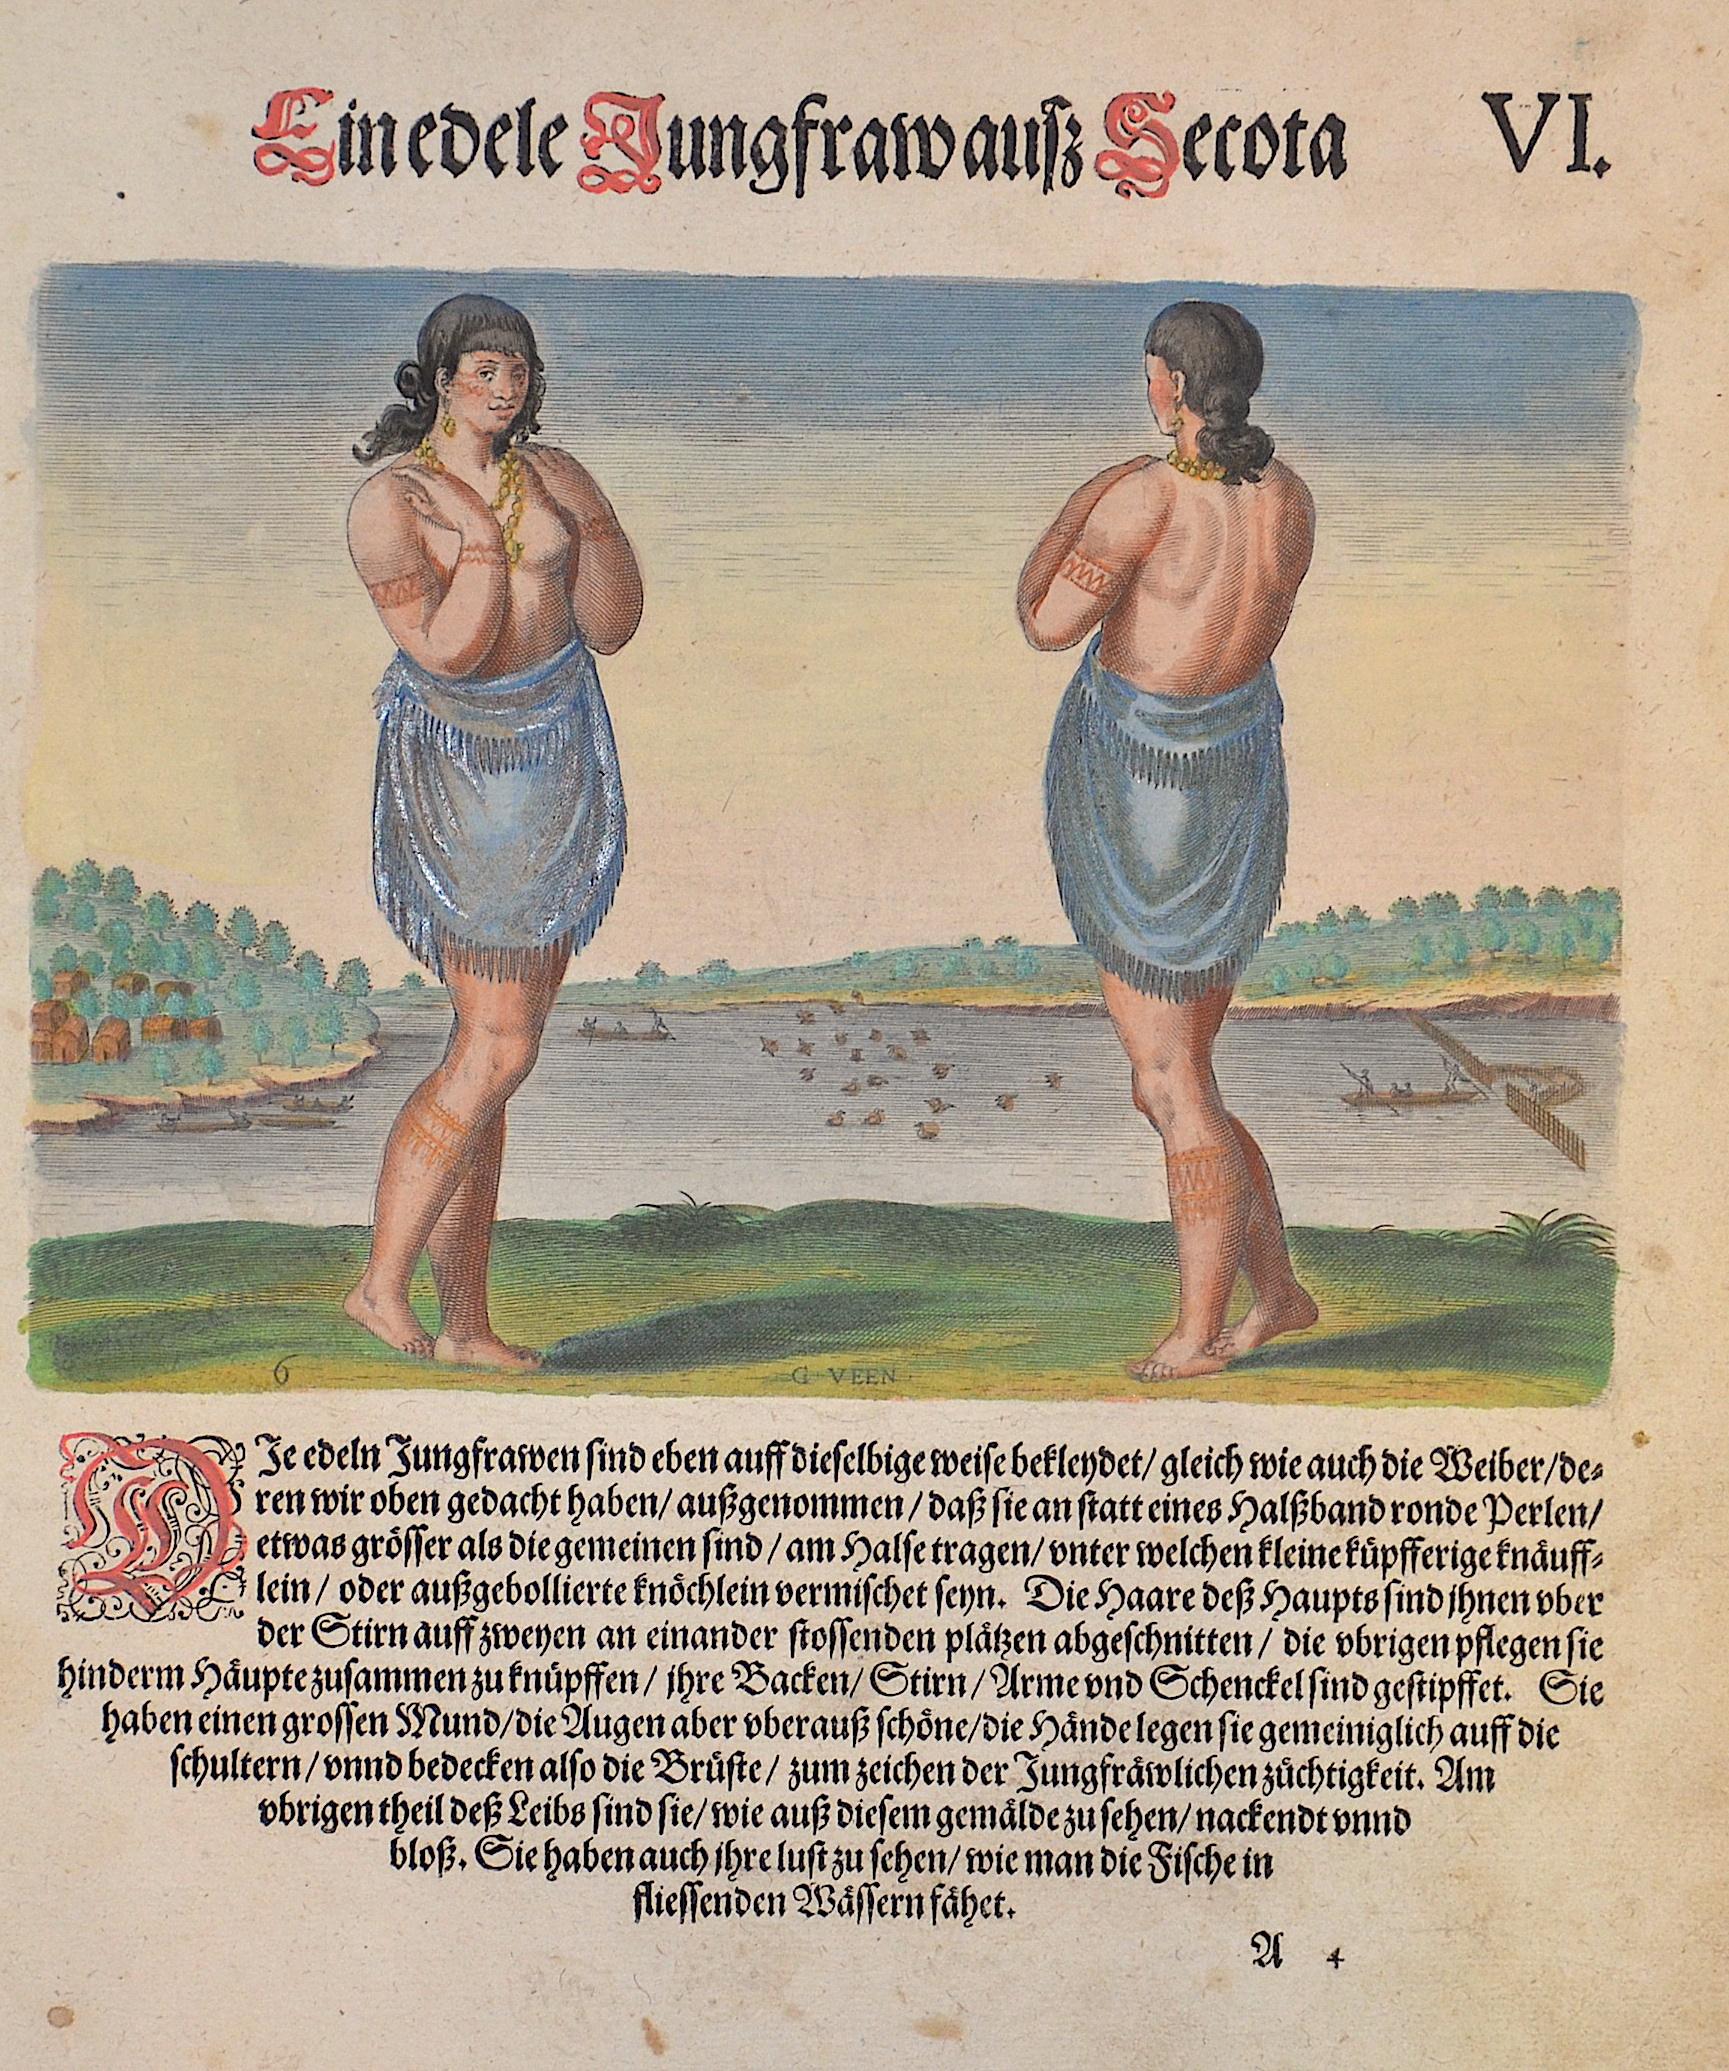 Bry, de  V. Ein edele Jungfraw auß Secota.